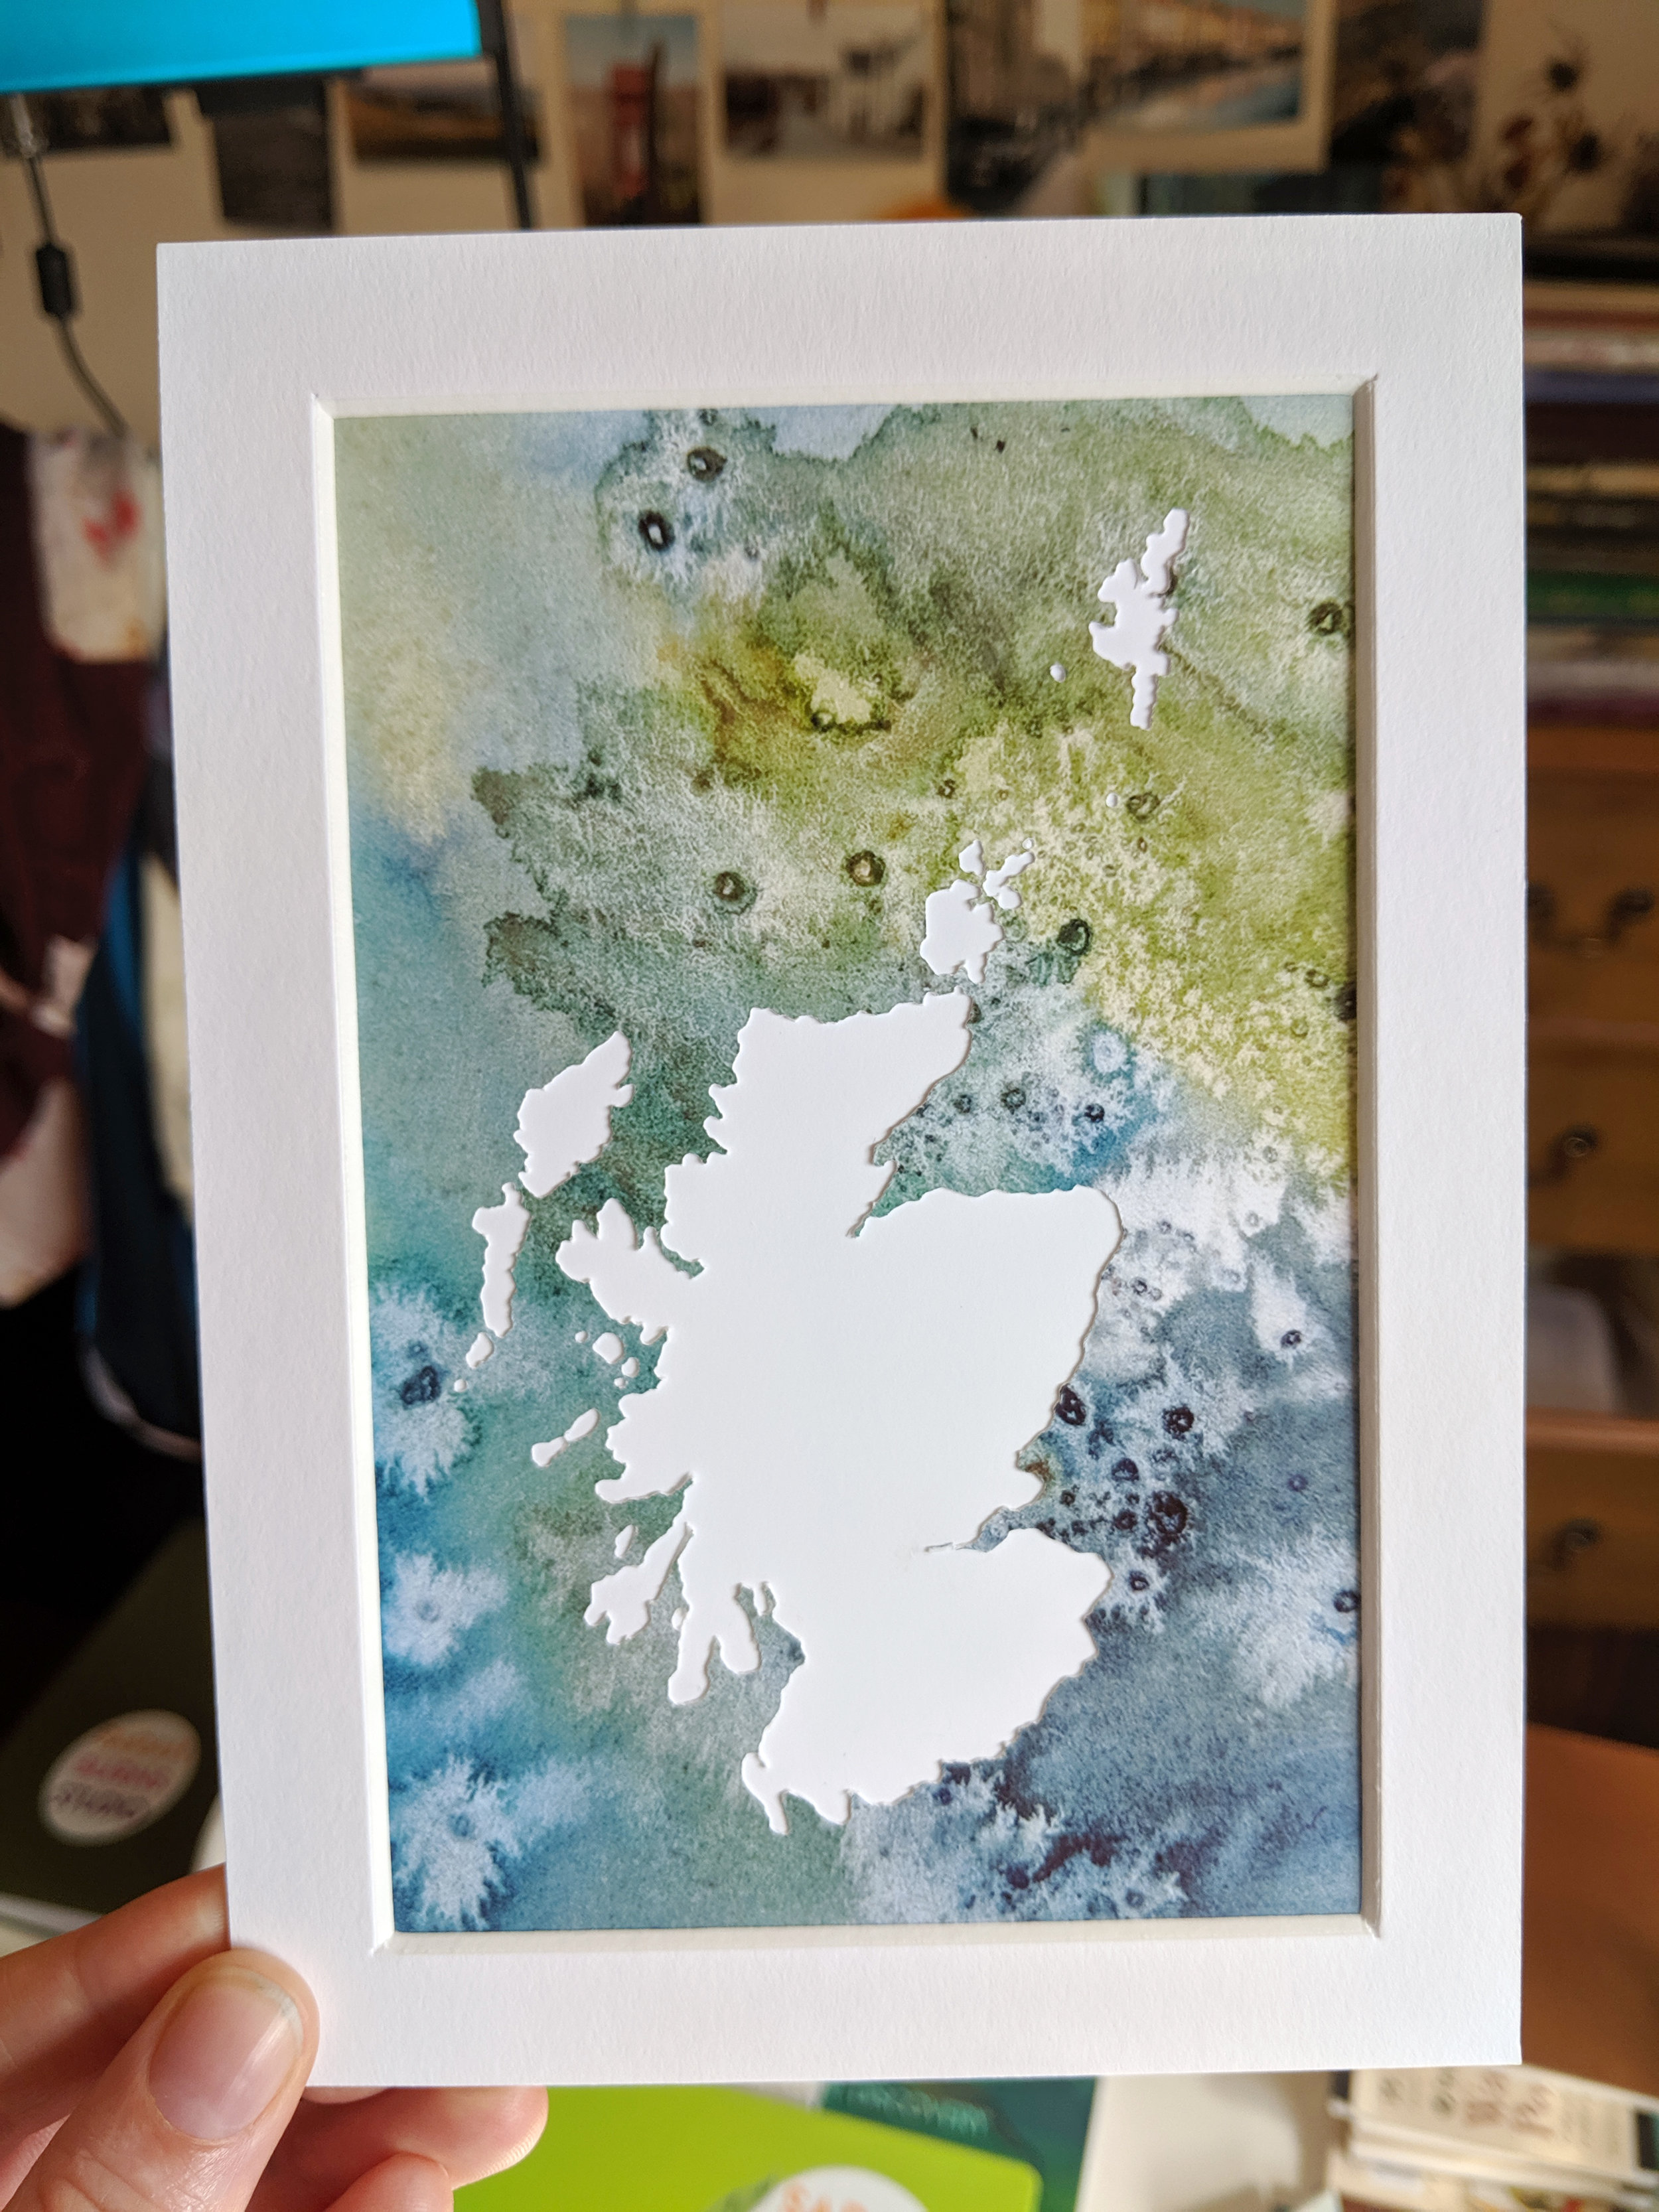 Scotland Map Cutout 3.jpg